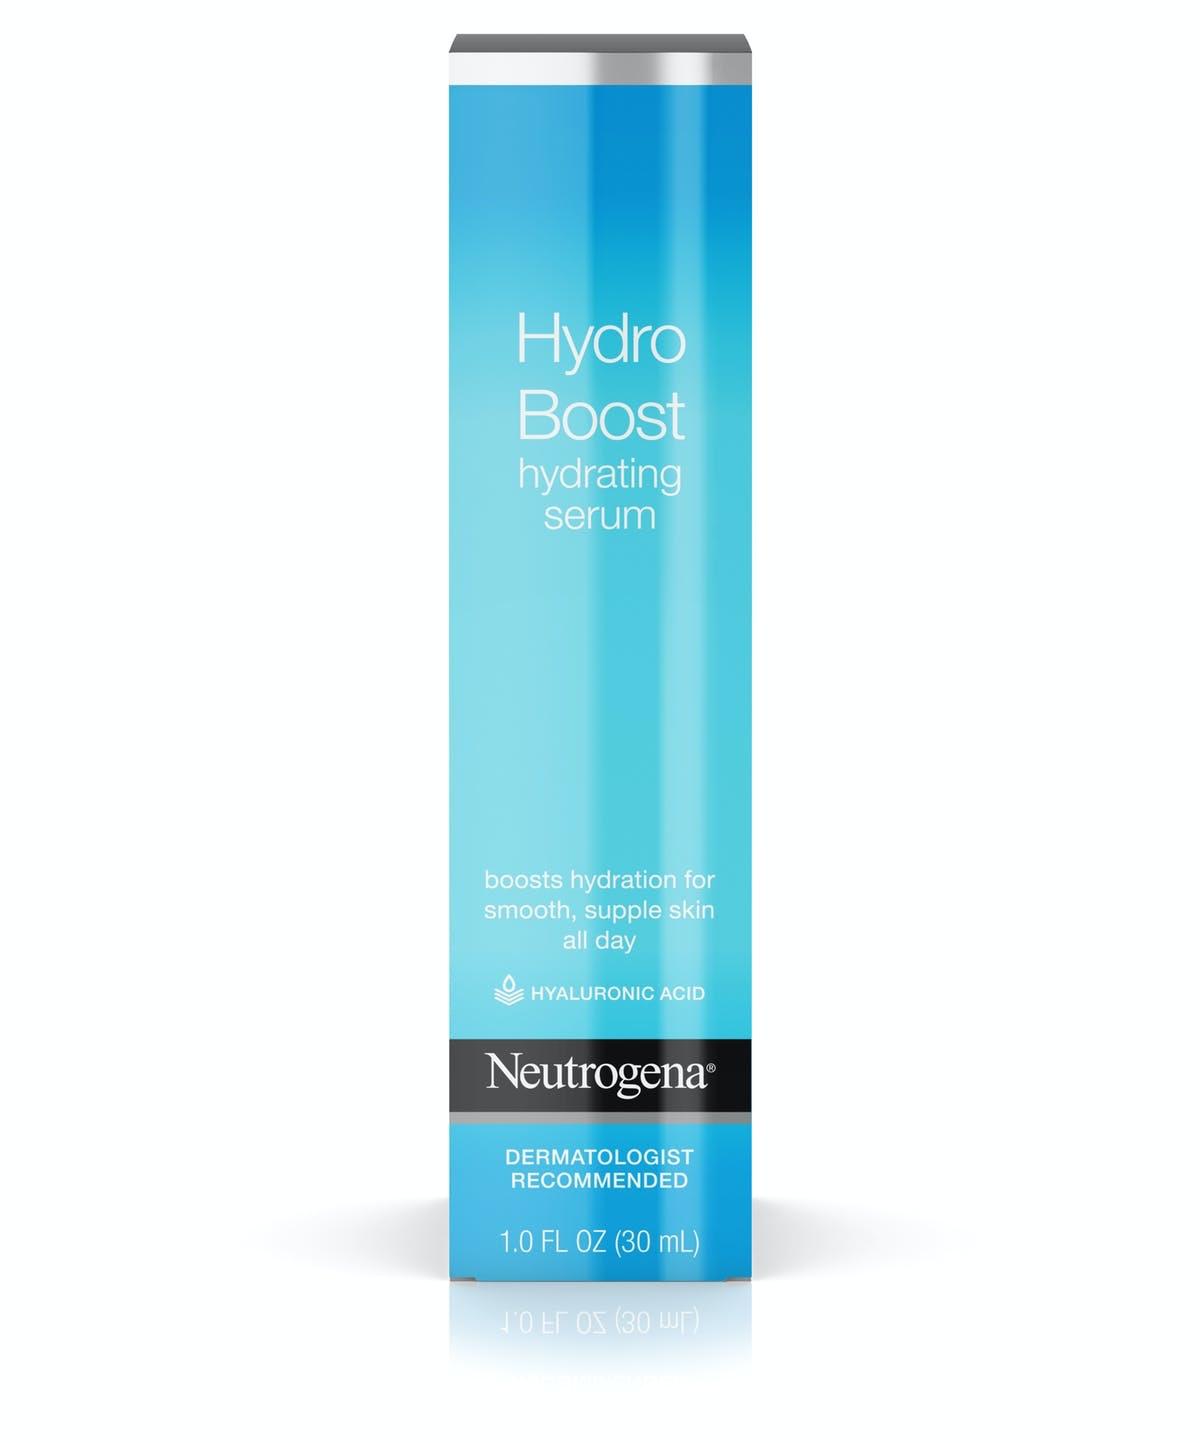 Hydro Boost Serum